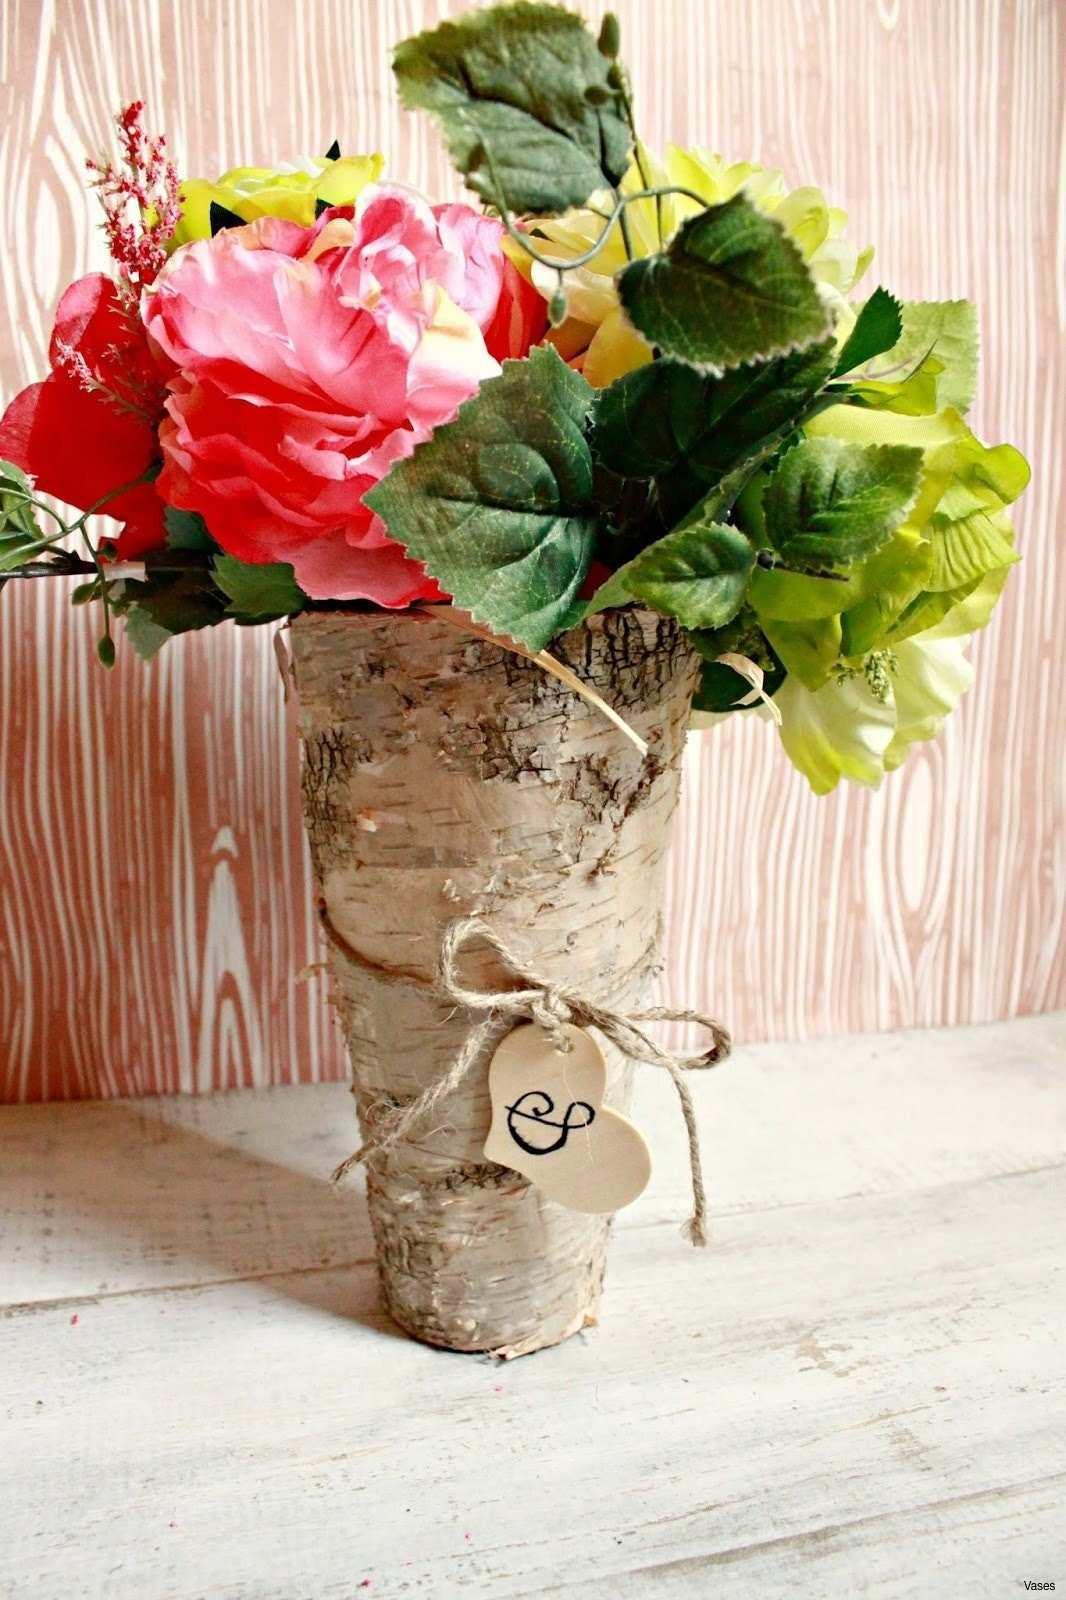 vase table centerpiece ideas of diy table decorations for wedding reception elegant flowers and pertaining to diy table decorations for wedding reception elegant flowers and decorations for